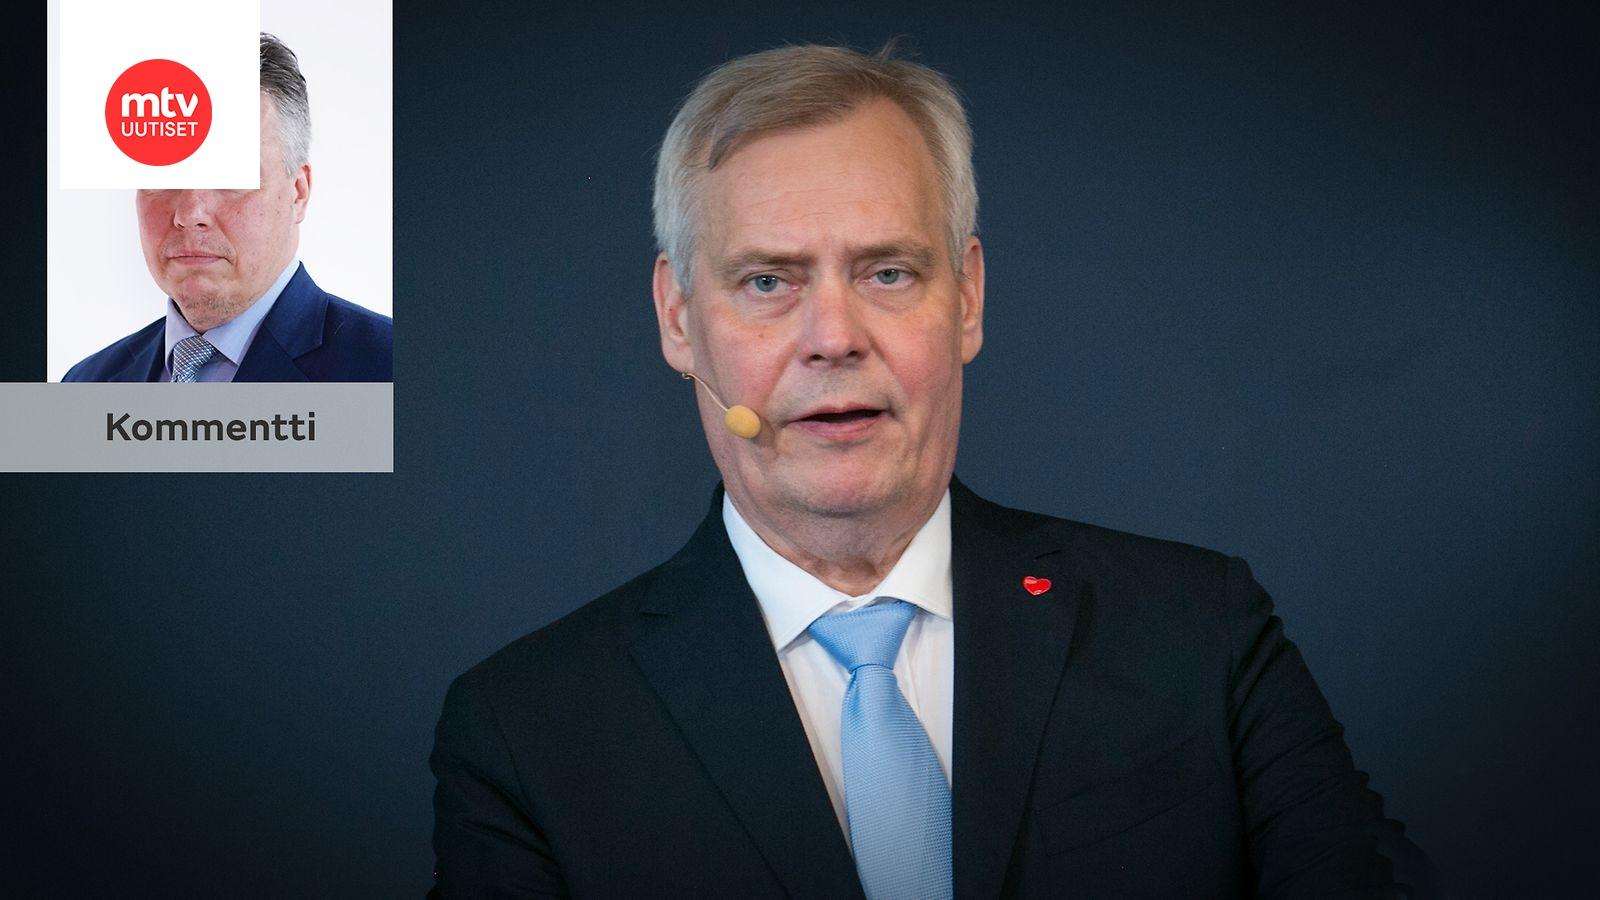 Jussi Kärki